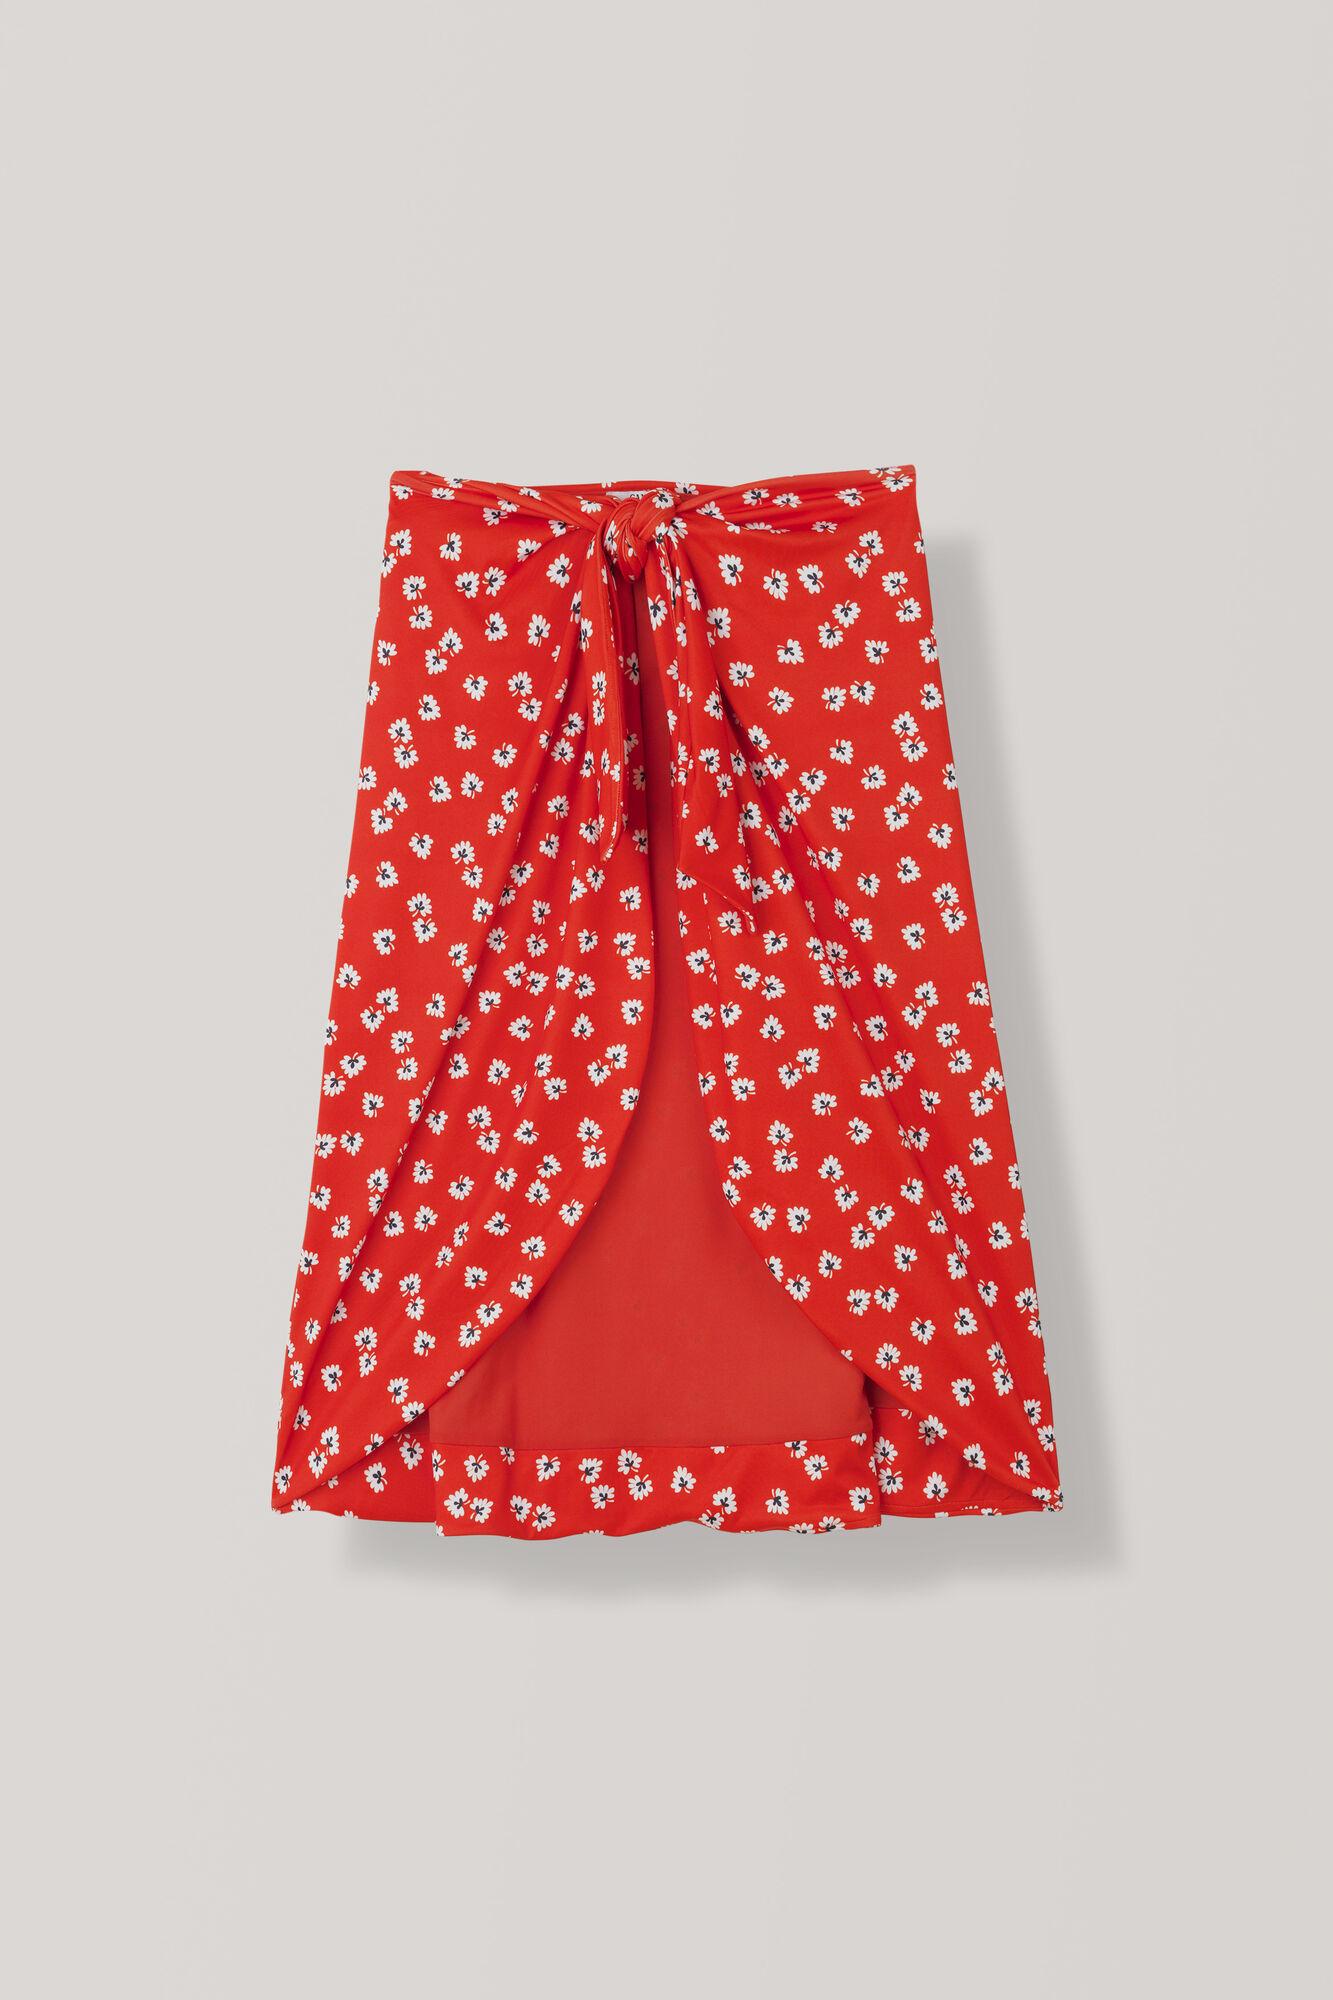 Columbine Swimwear Skirt, Big Apple Red, hi-res